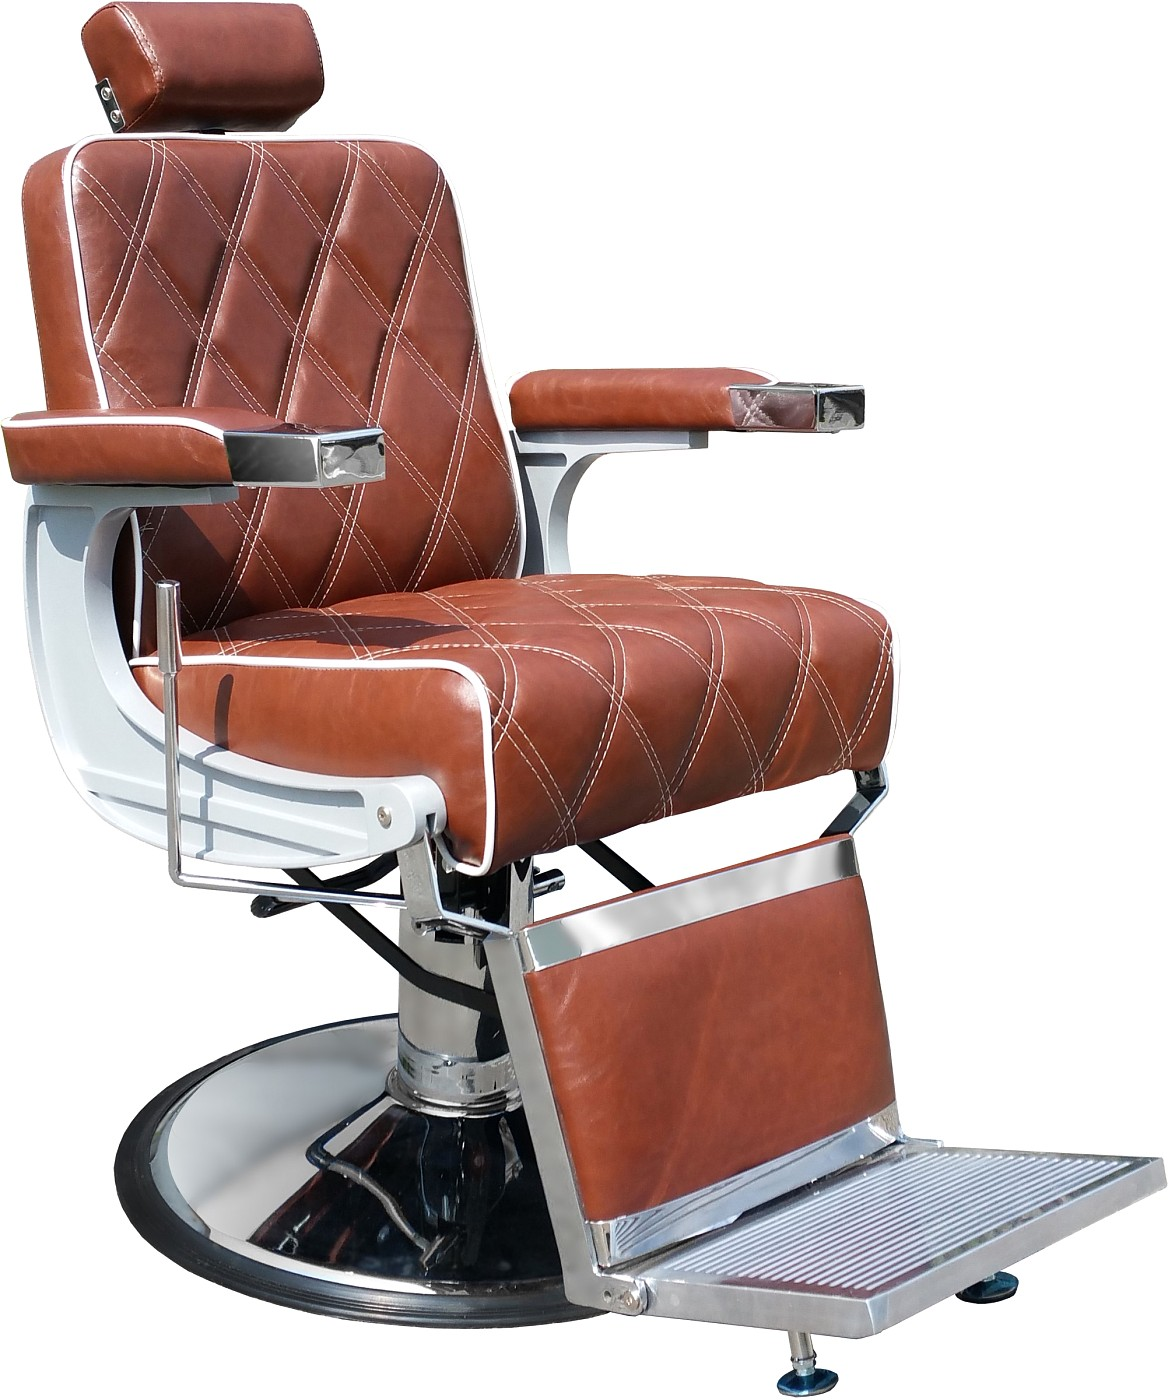 Barber Chair Charles cognac